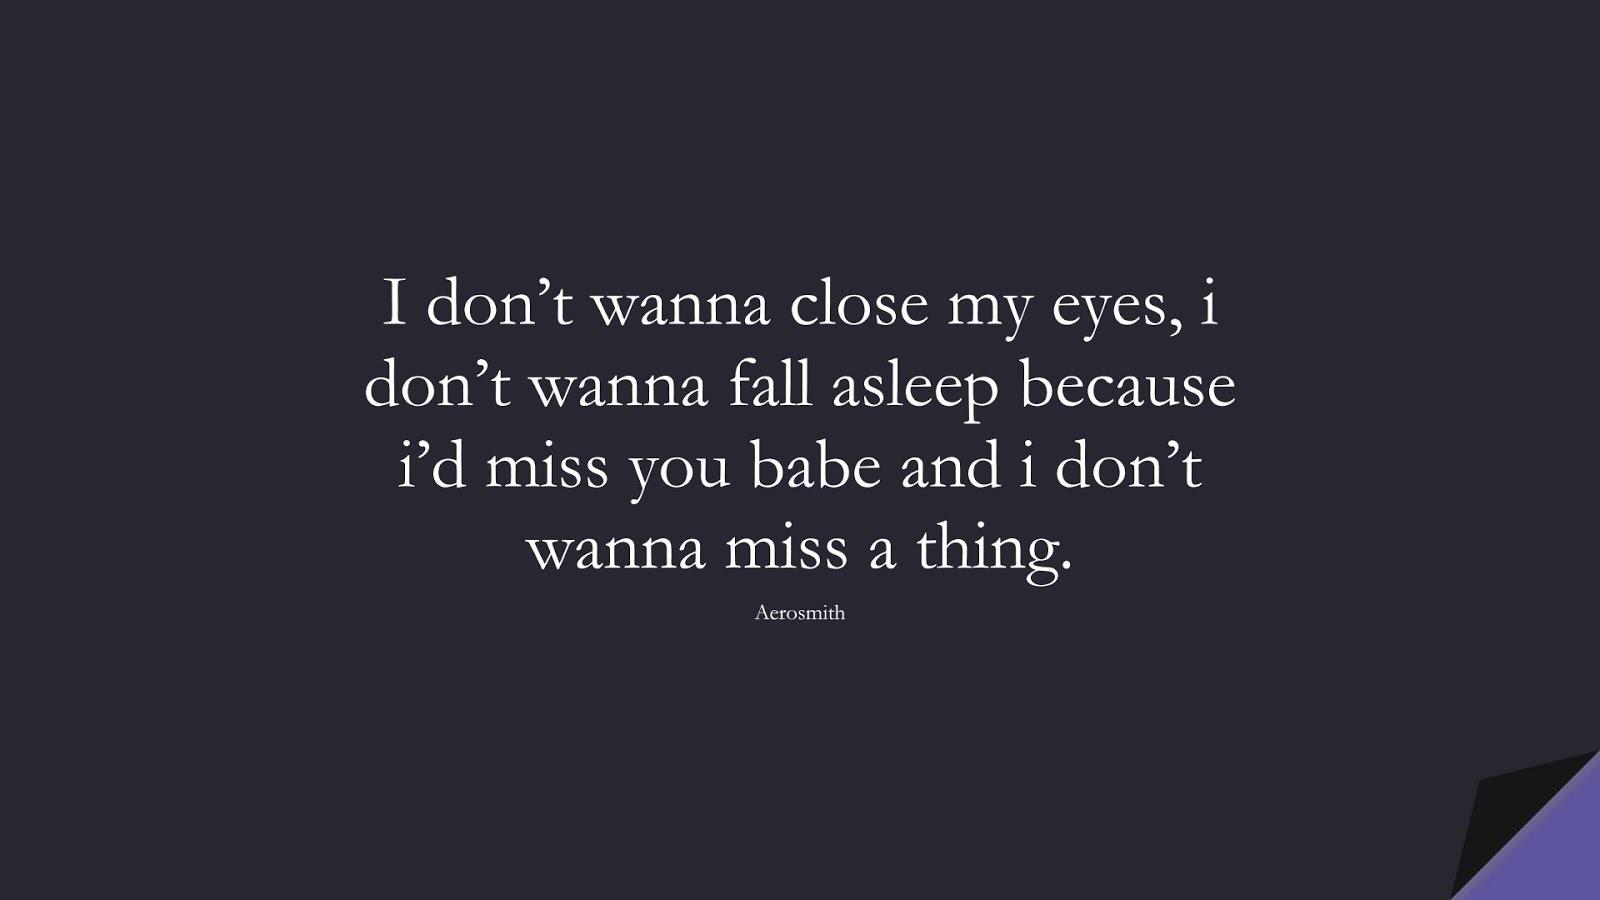 I don't wanna close my eyes, i don't wanna fall asleep because i'd miss you babe and i don't wanna miss a thing. (Aerosmith);  #LoveQuotes